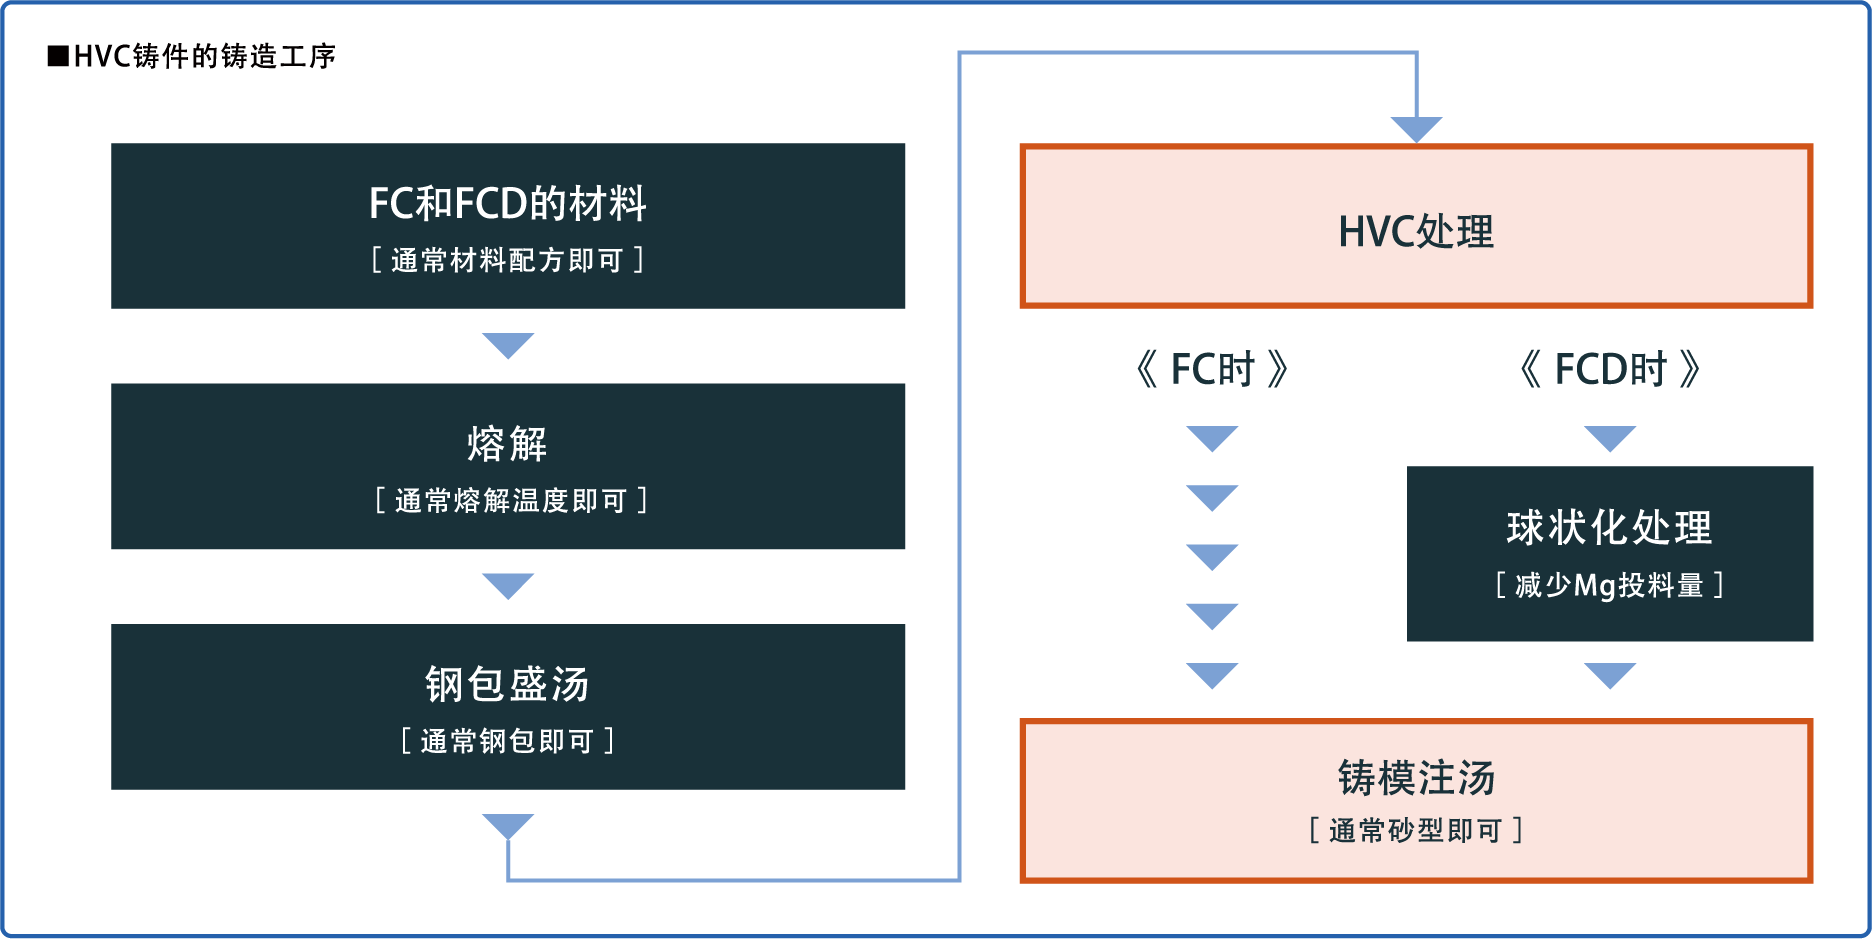 HVC铸件的铸造工序